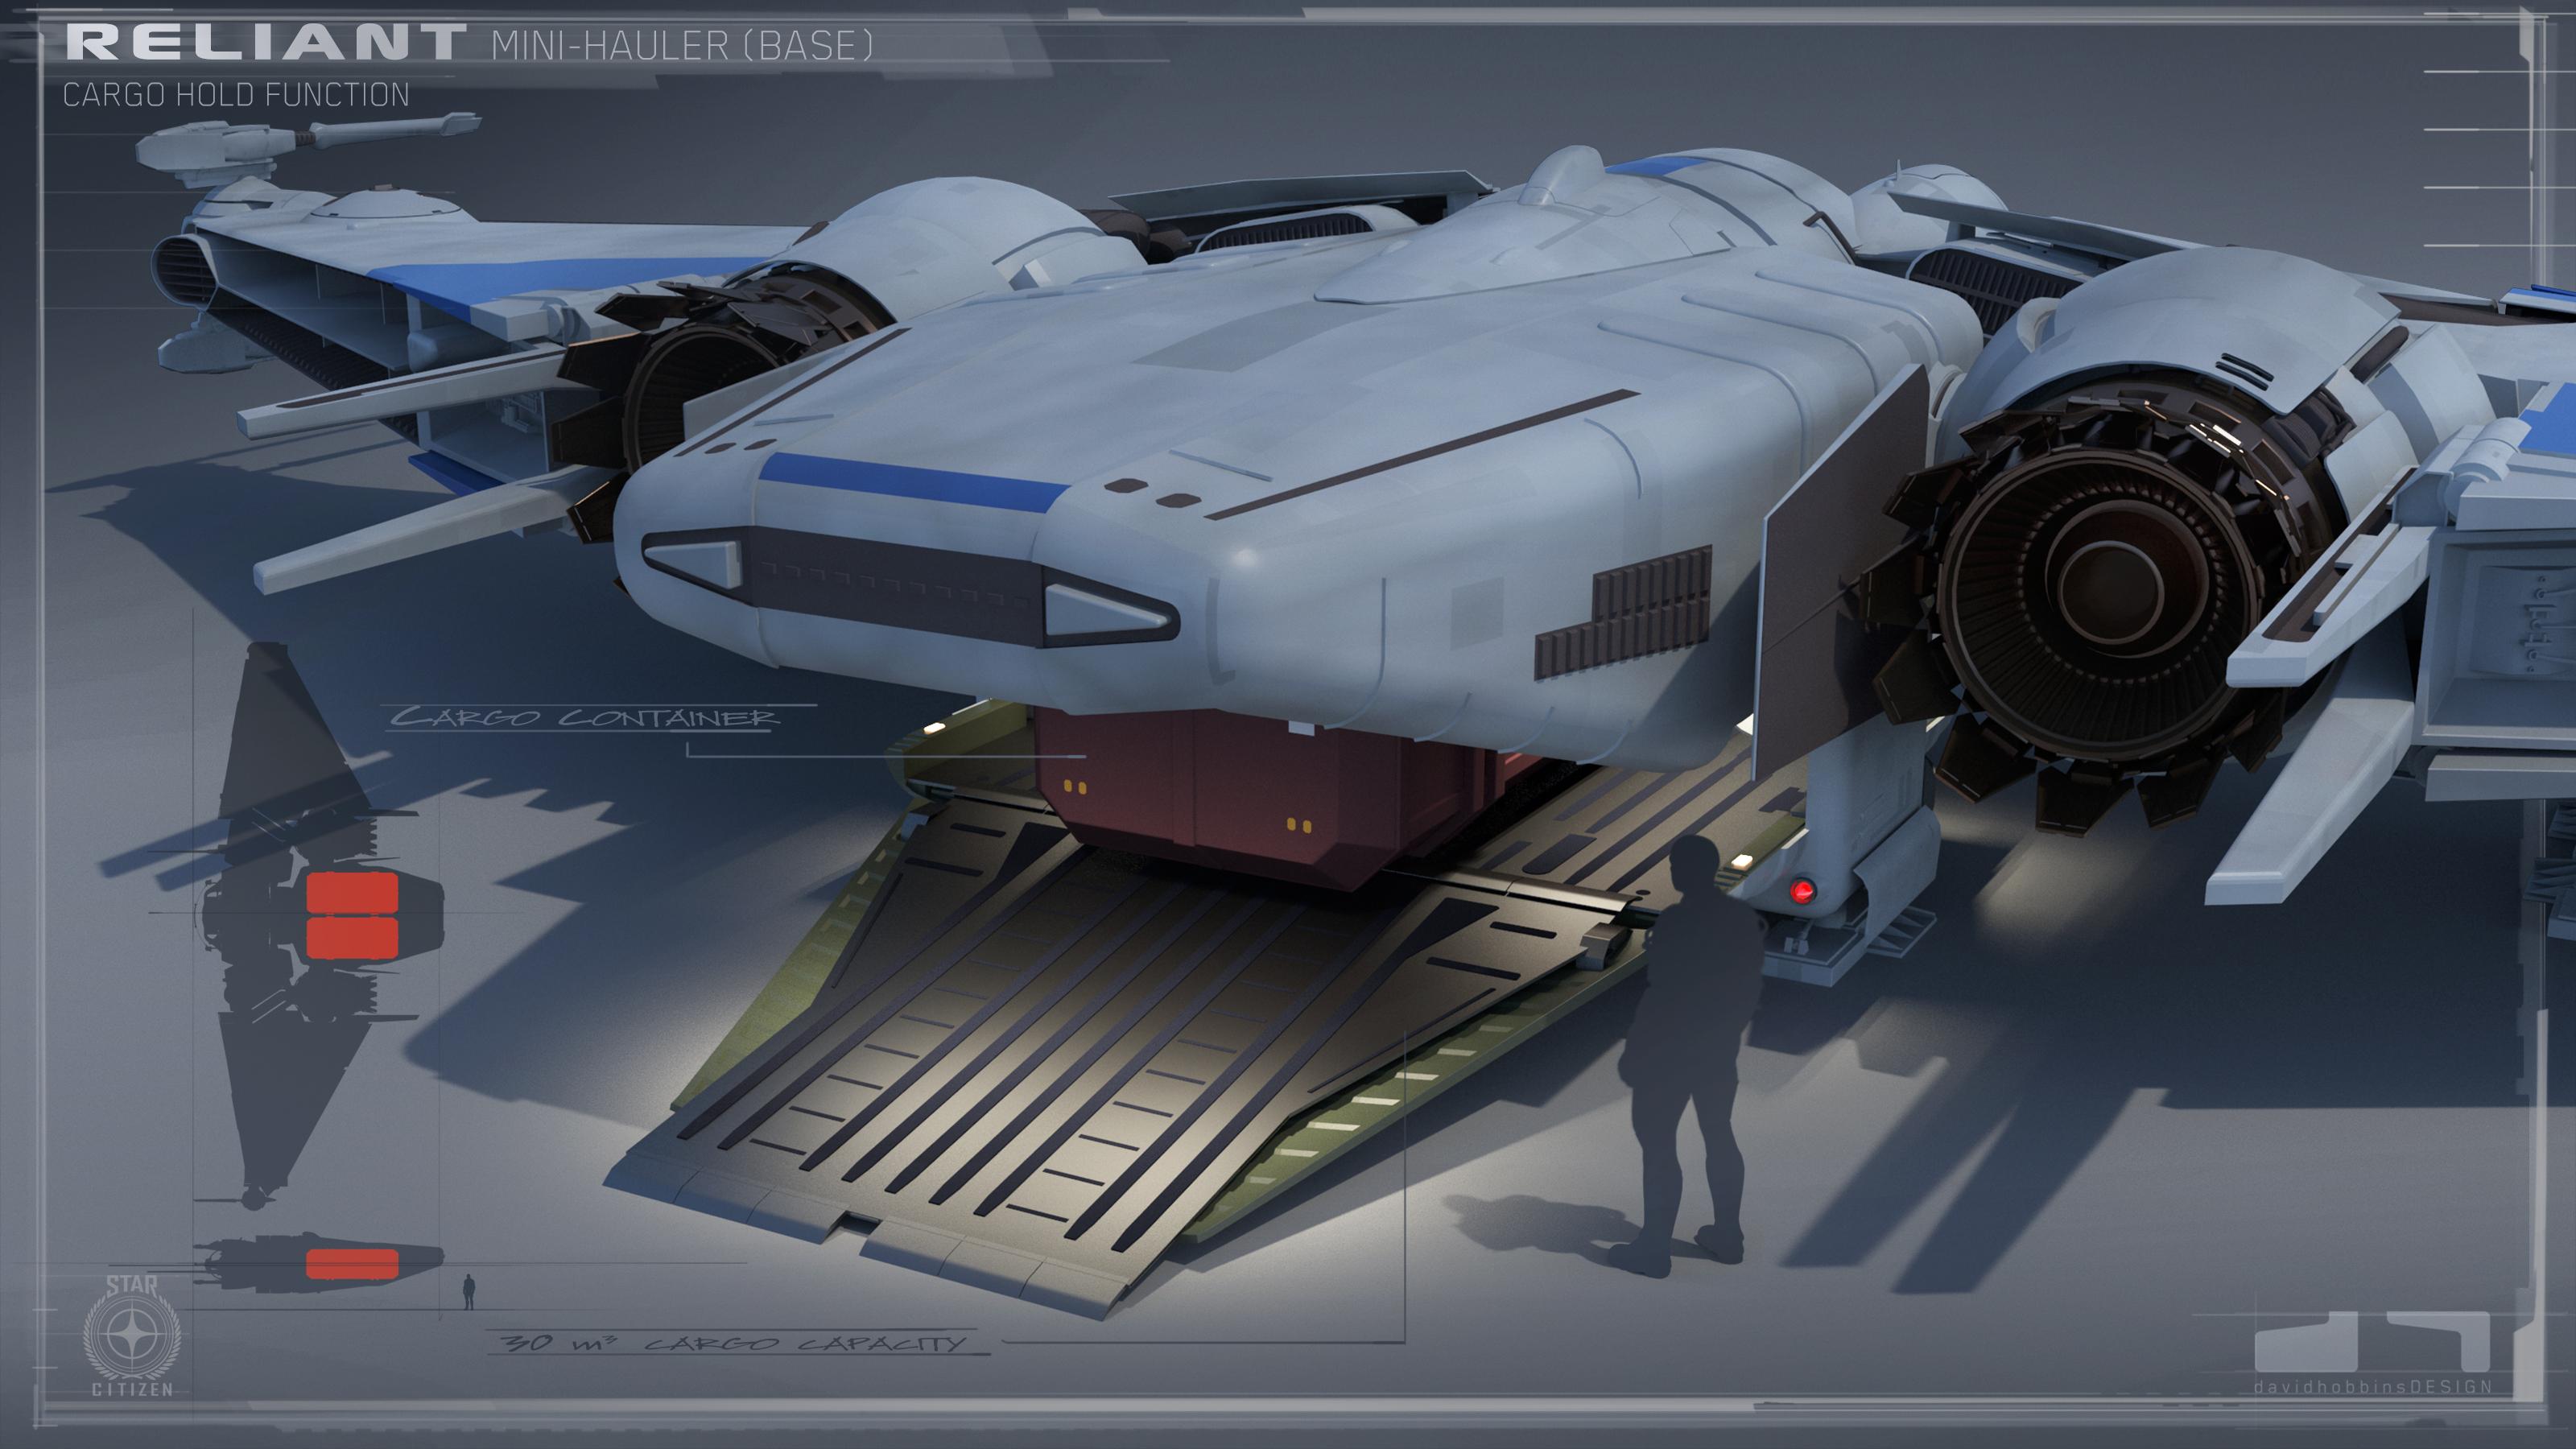 0415-Reliant_CargoHoldFunction_Final_Hob